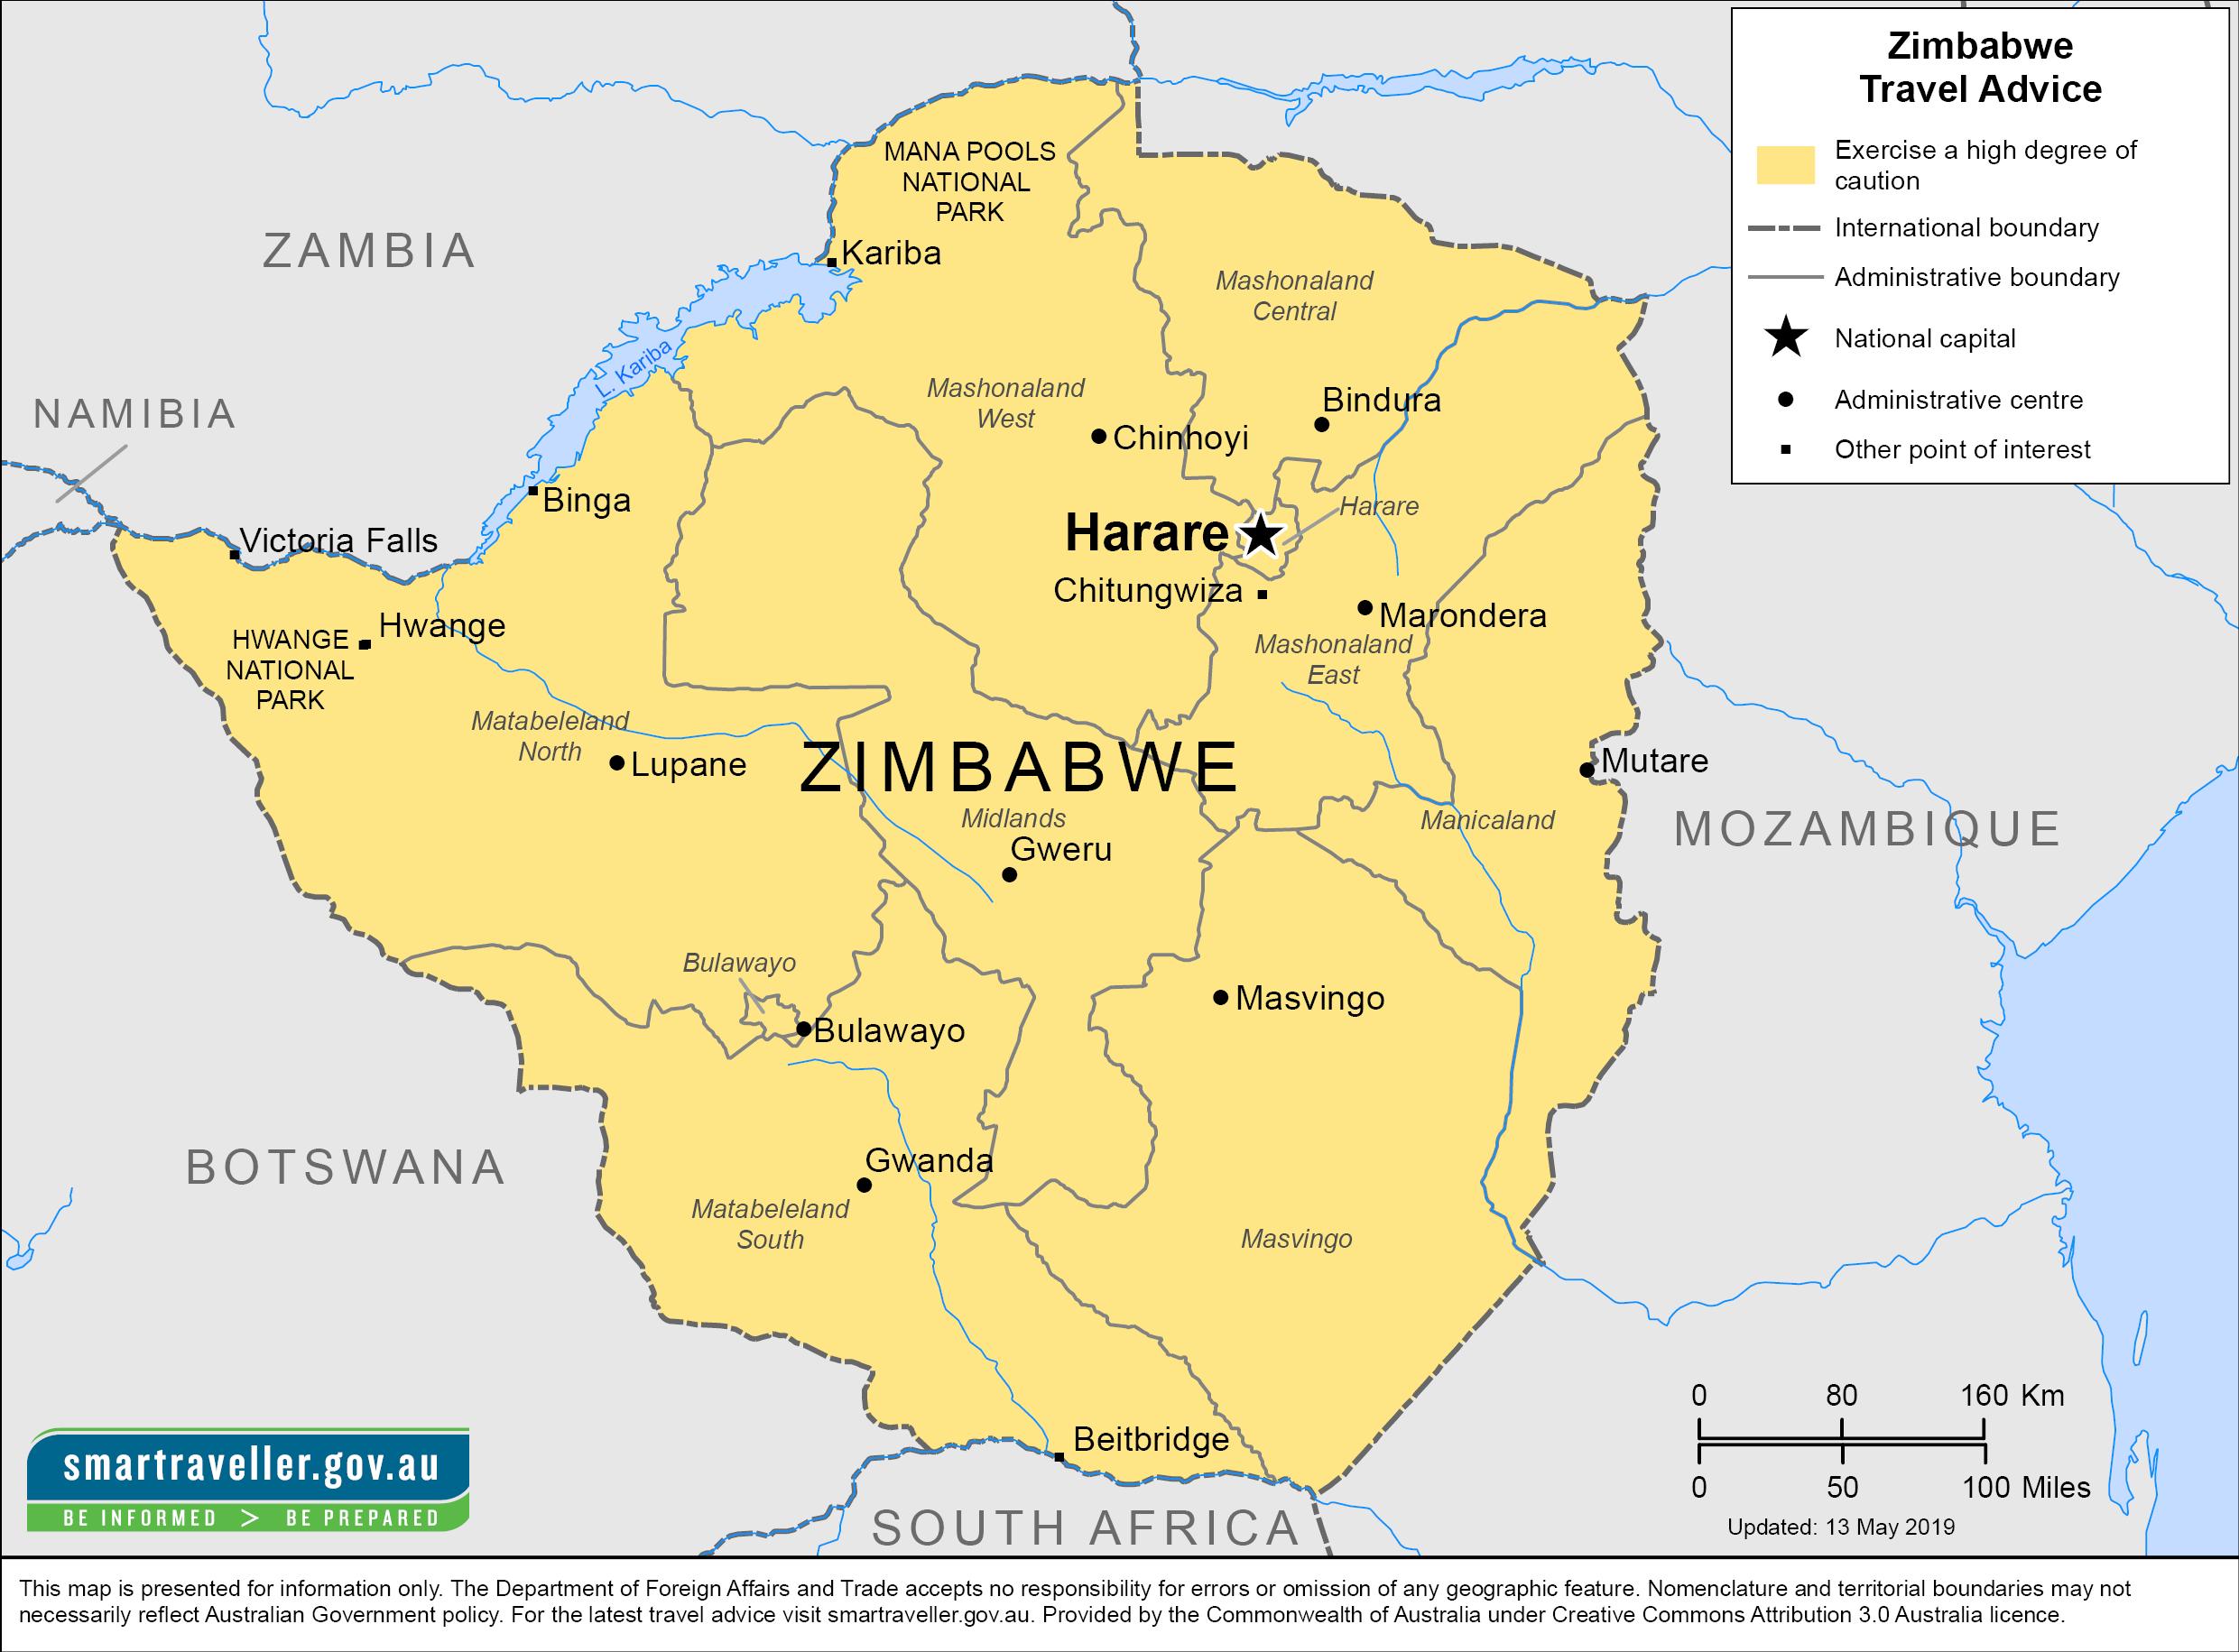 Zimbabwe-Travel-Insurance | AARDY.com